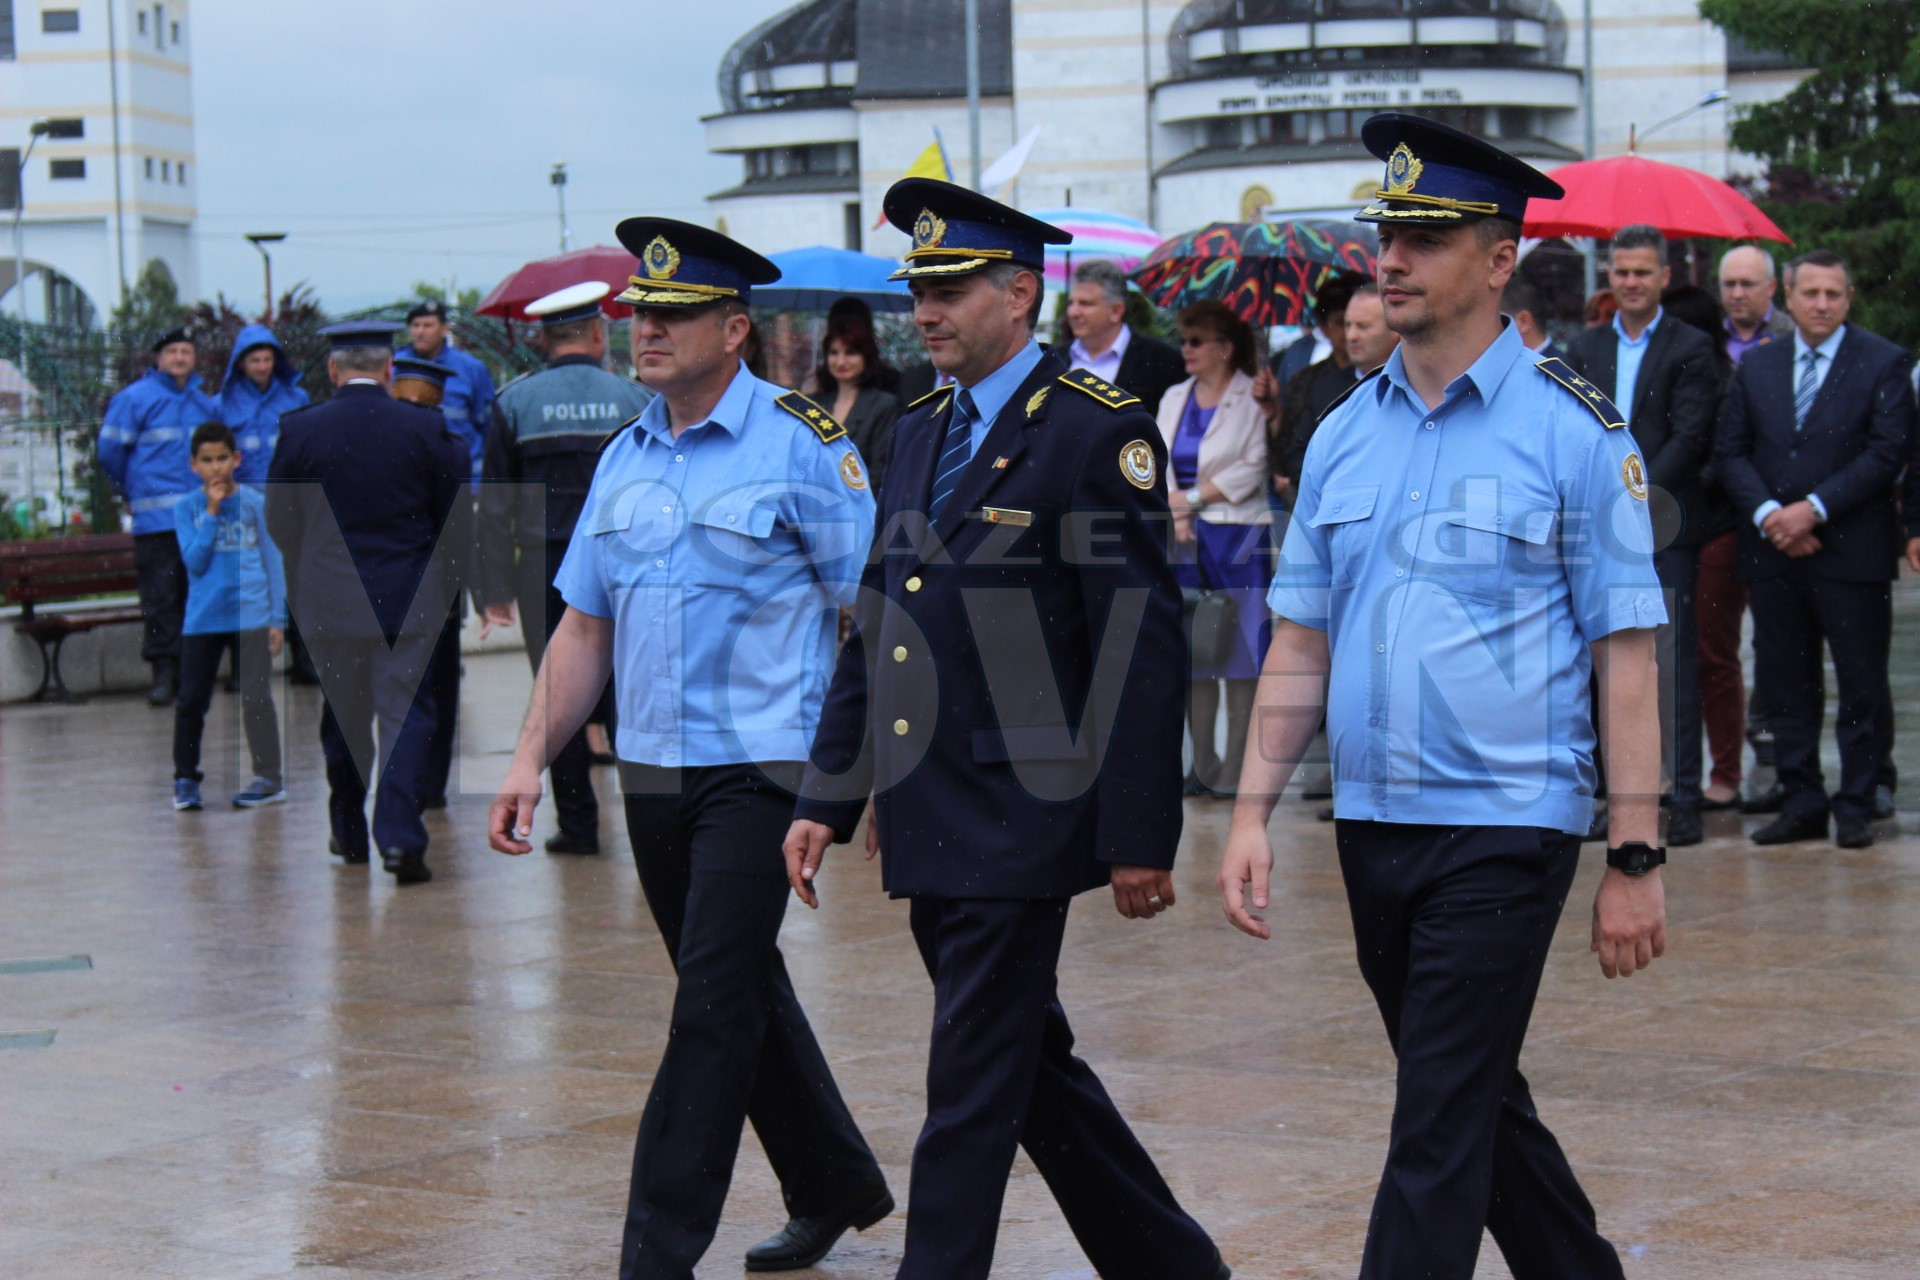 depunere-de-coroane-mioveni-ziua-eroilor-25-05-2017 (11)